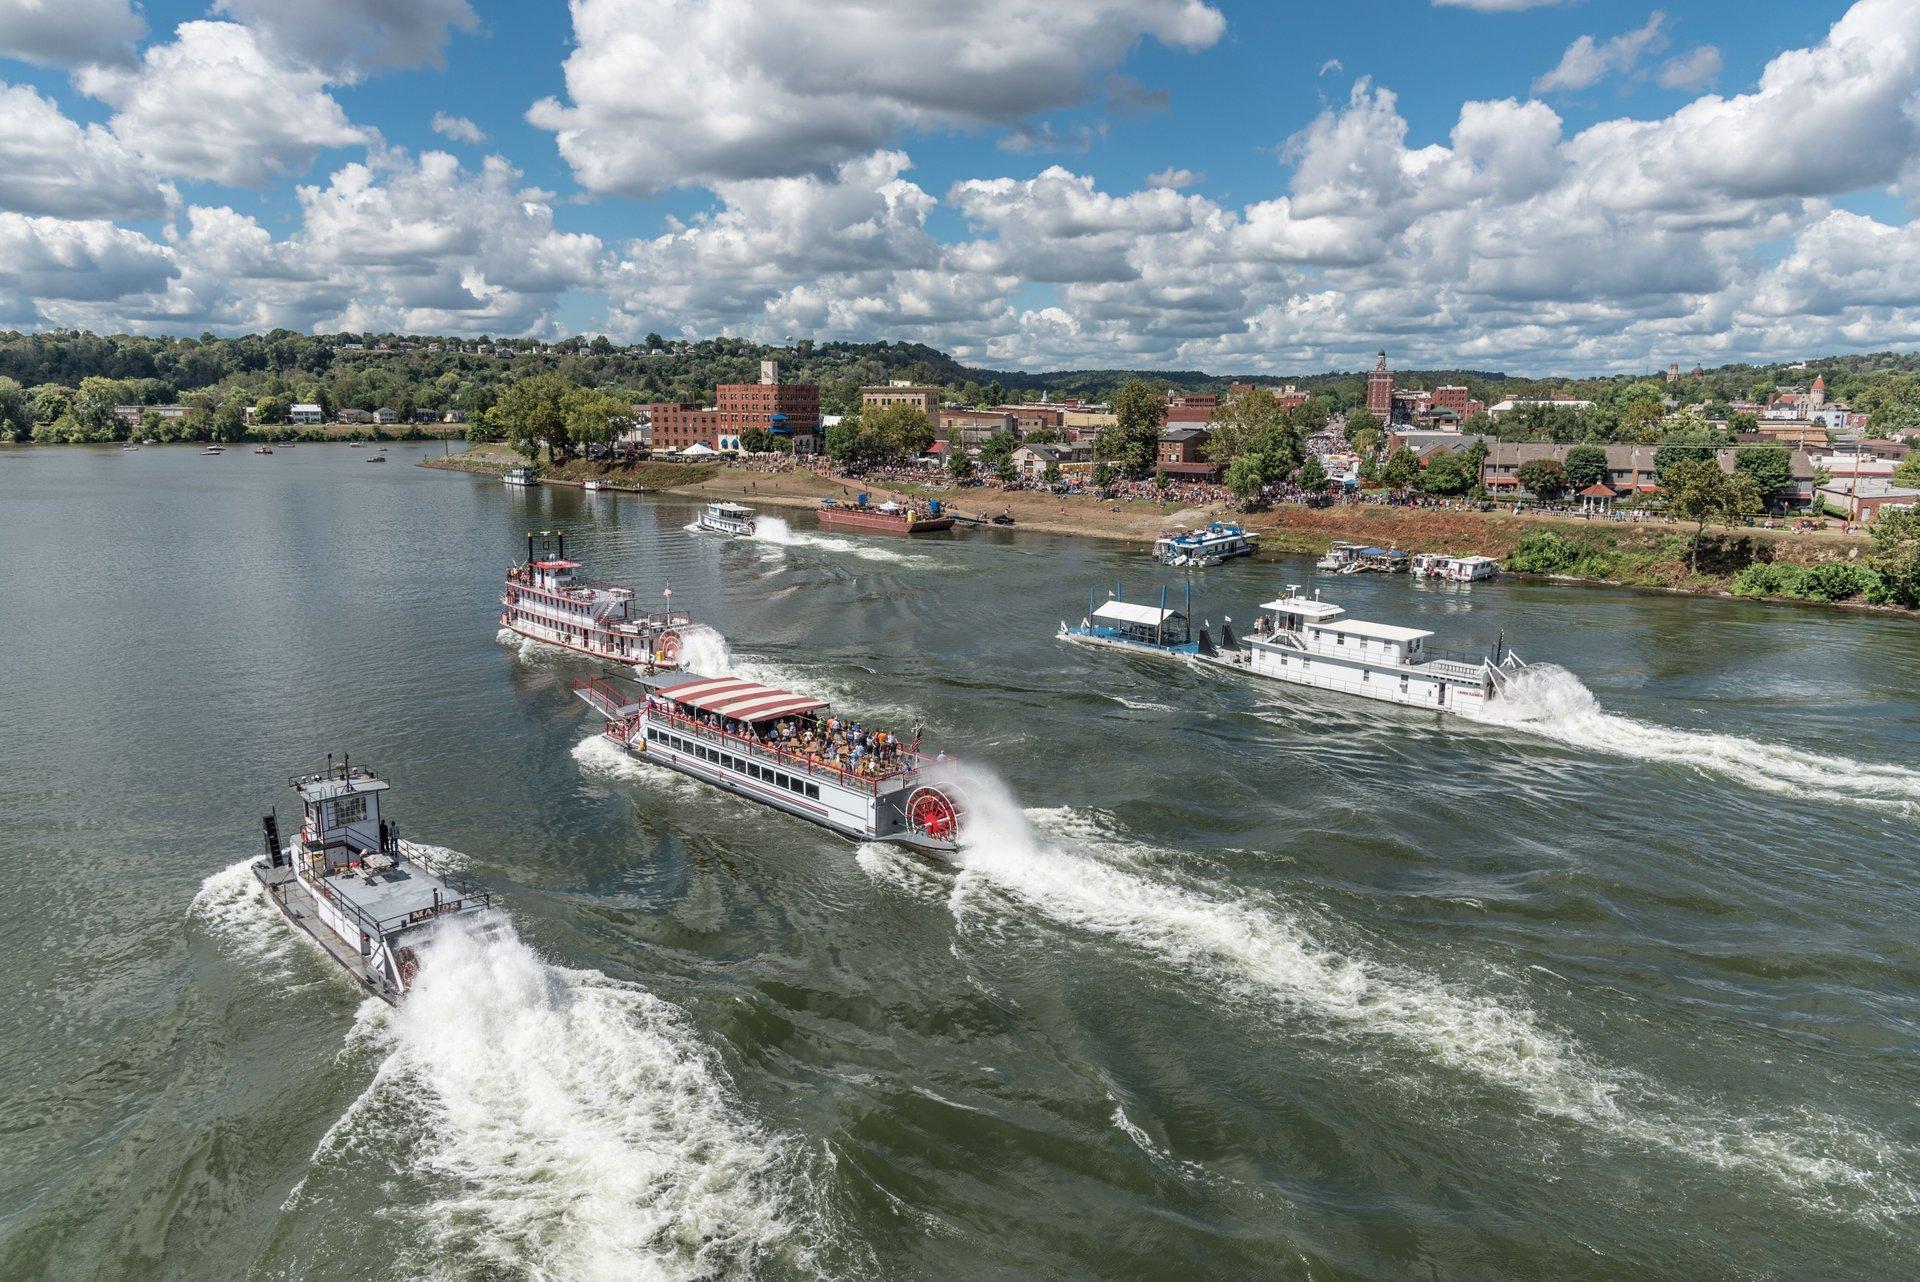 Ohio River Sternwheel Festival in Ohio 2020 - Best Time